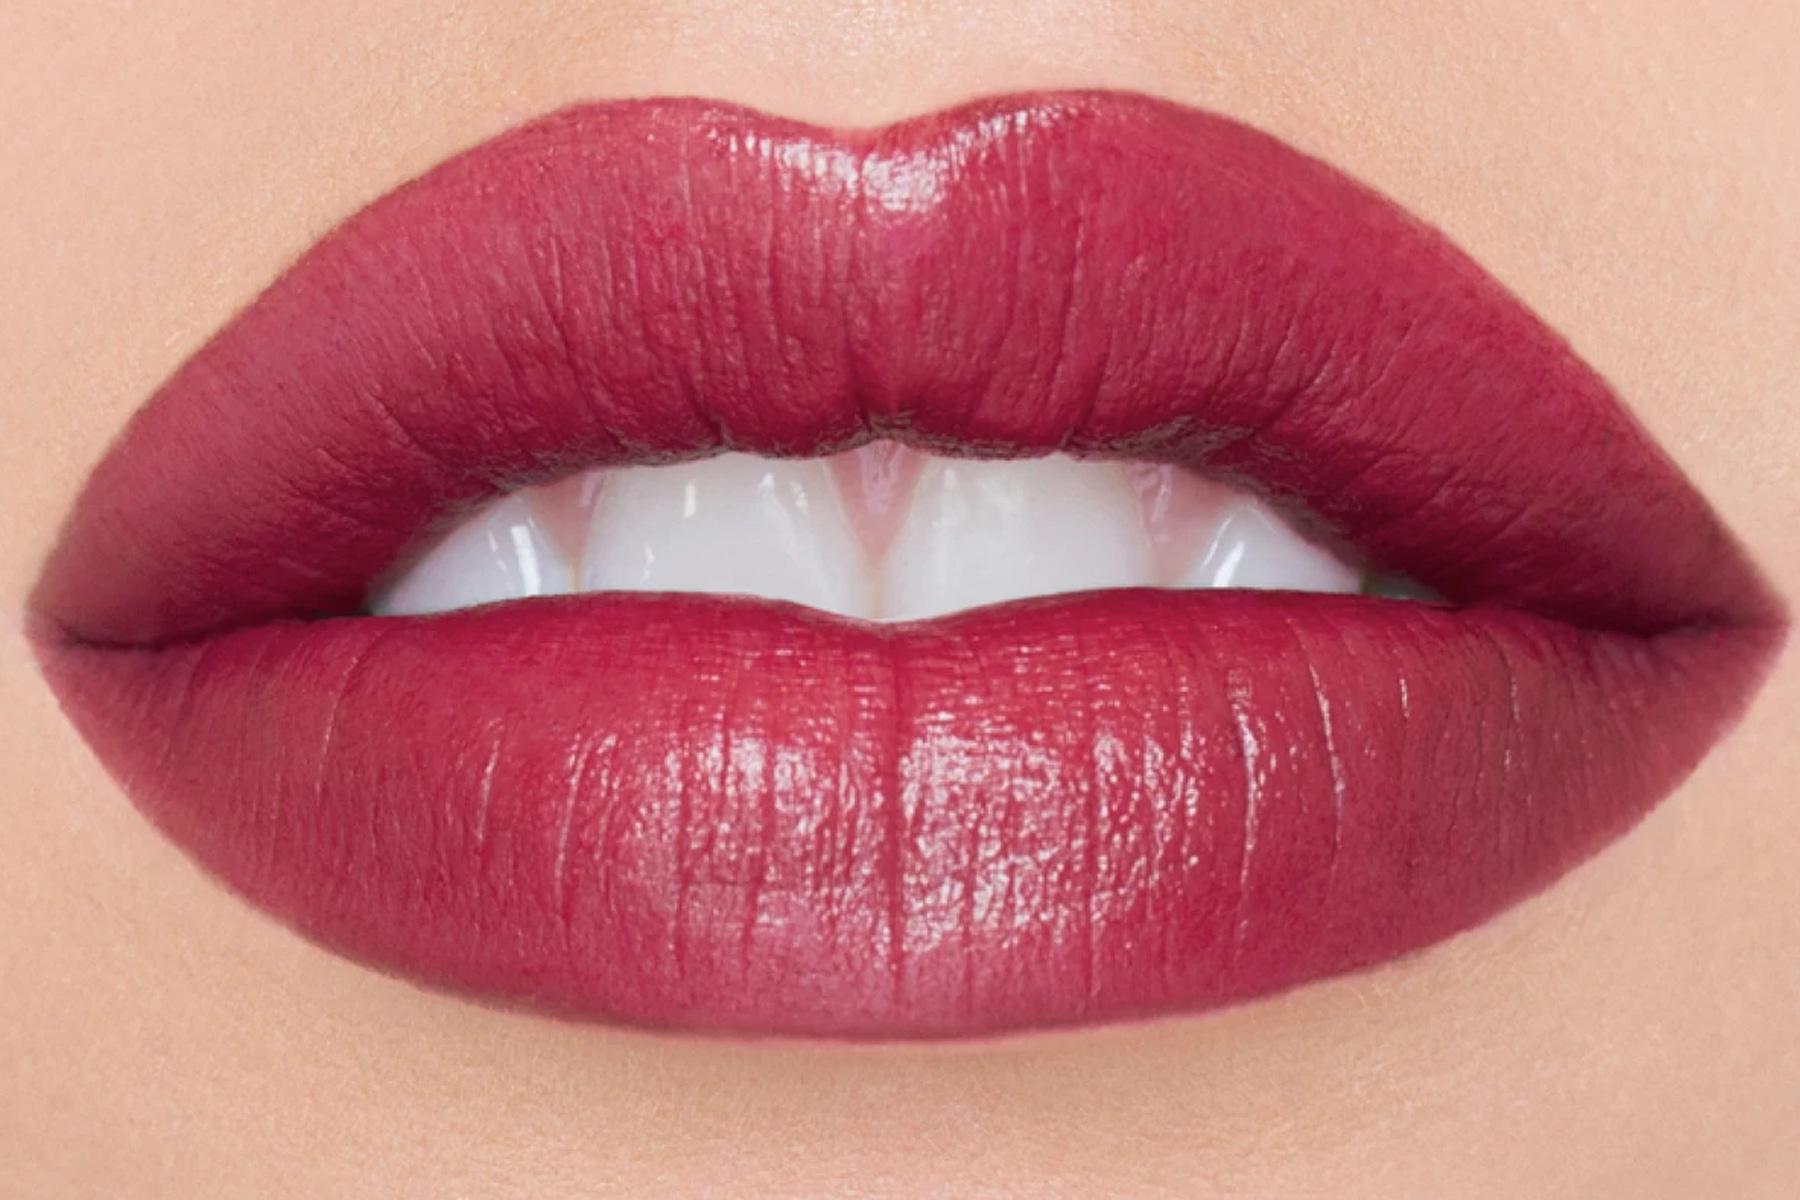 chantecaille lip veil azalea swatch